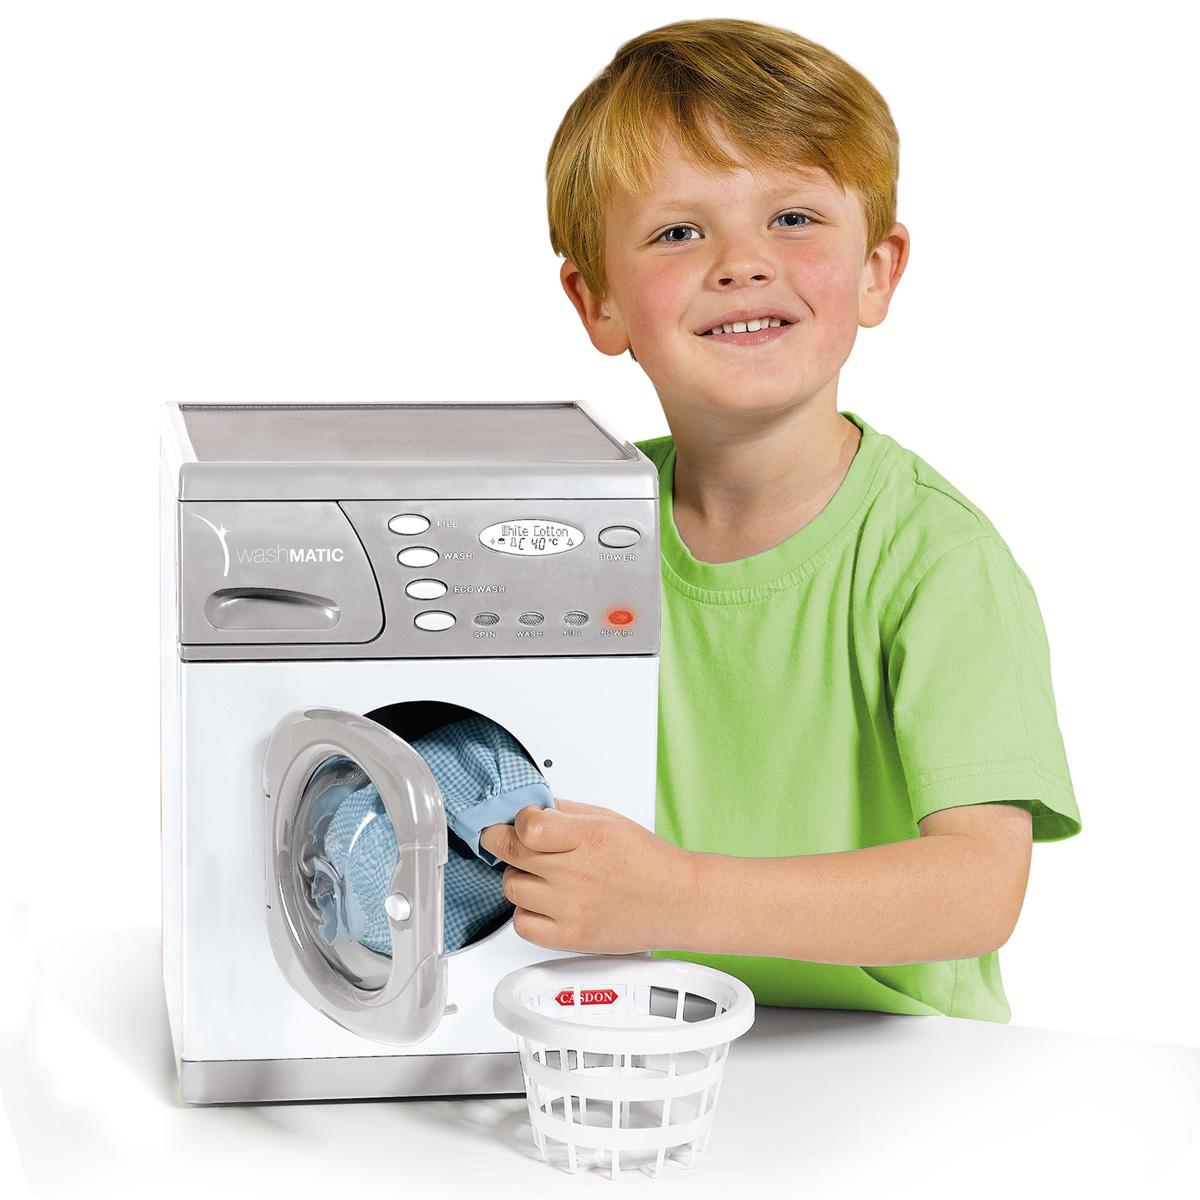 casdon elektrische spiel waschmaschine f r kinder korb. Black Bedroom Furniture Sets. Home Design Ideas